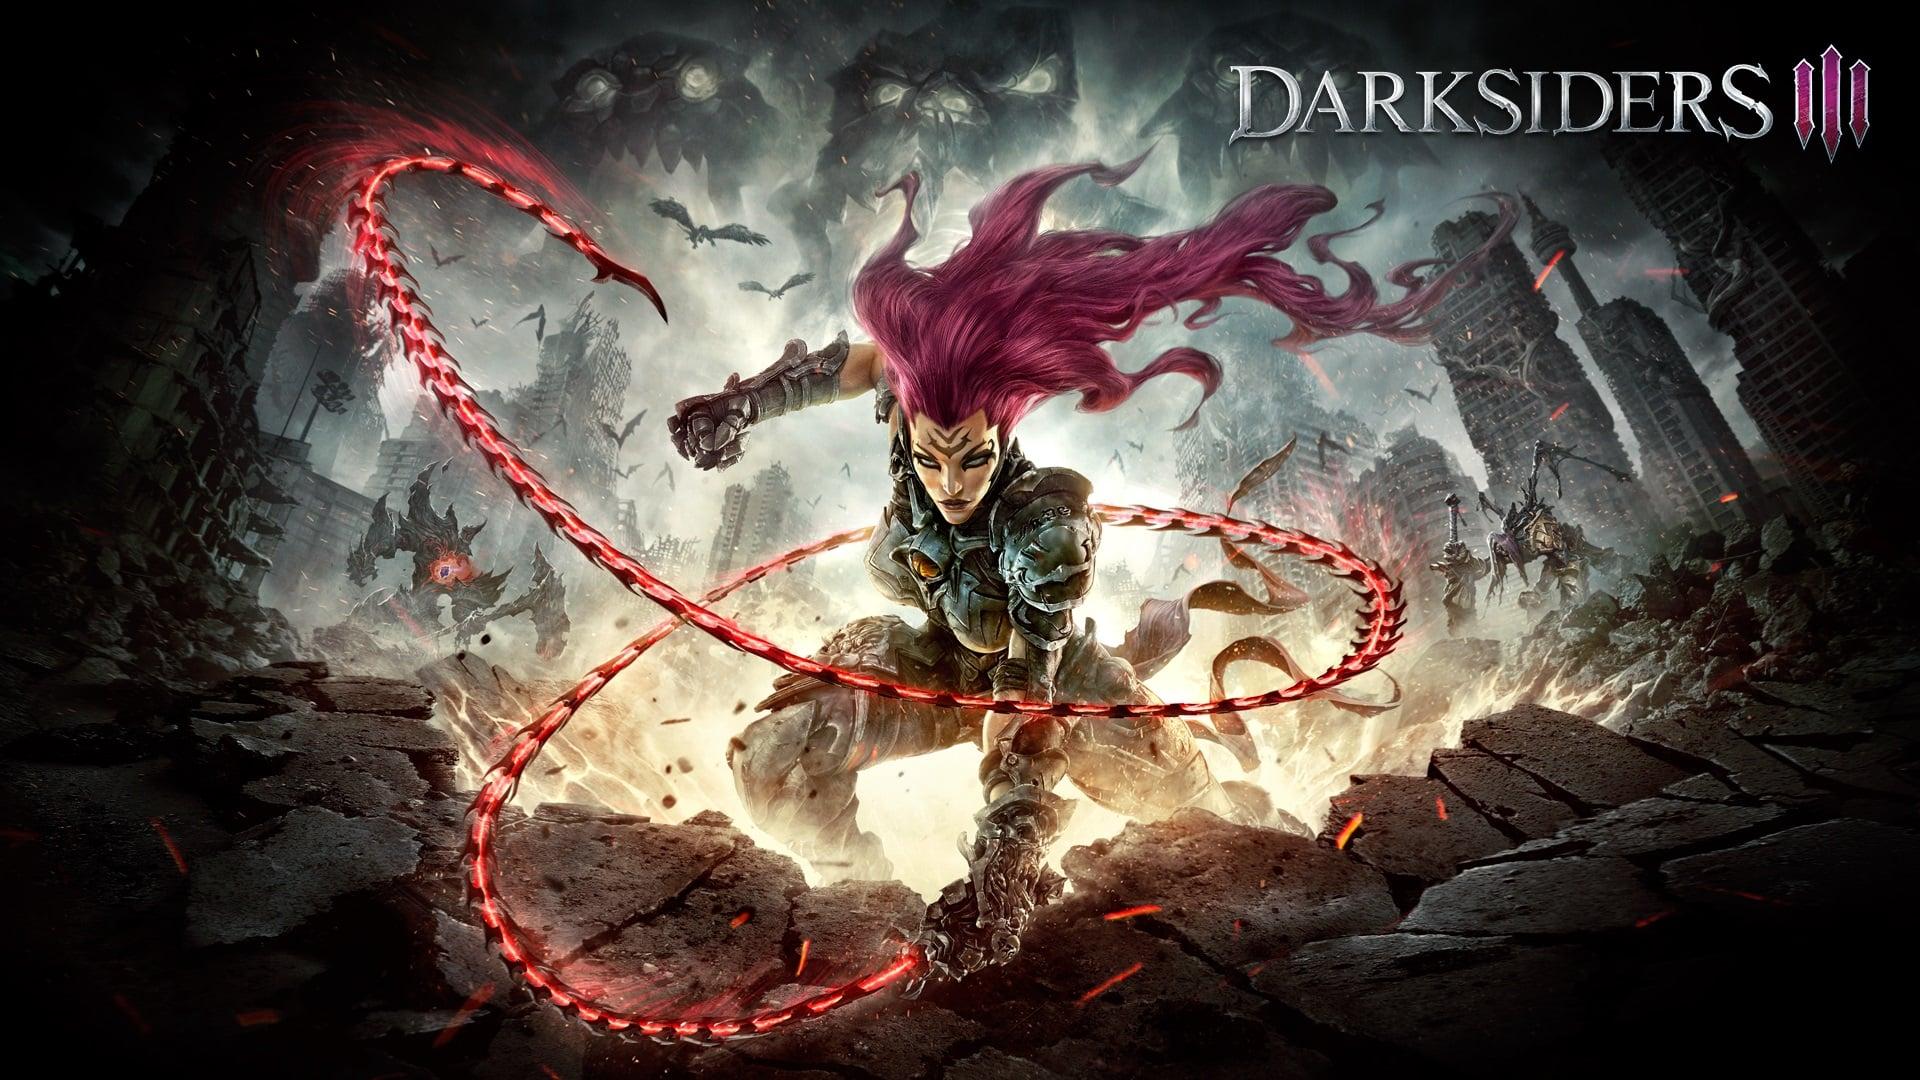 Darksiders III Achievements